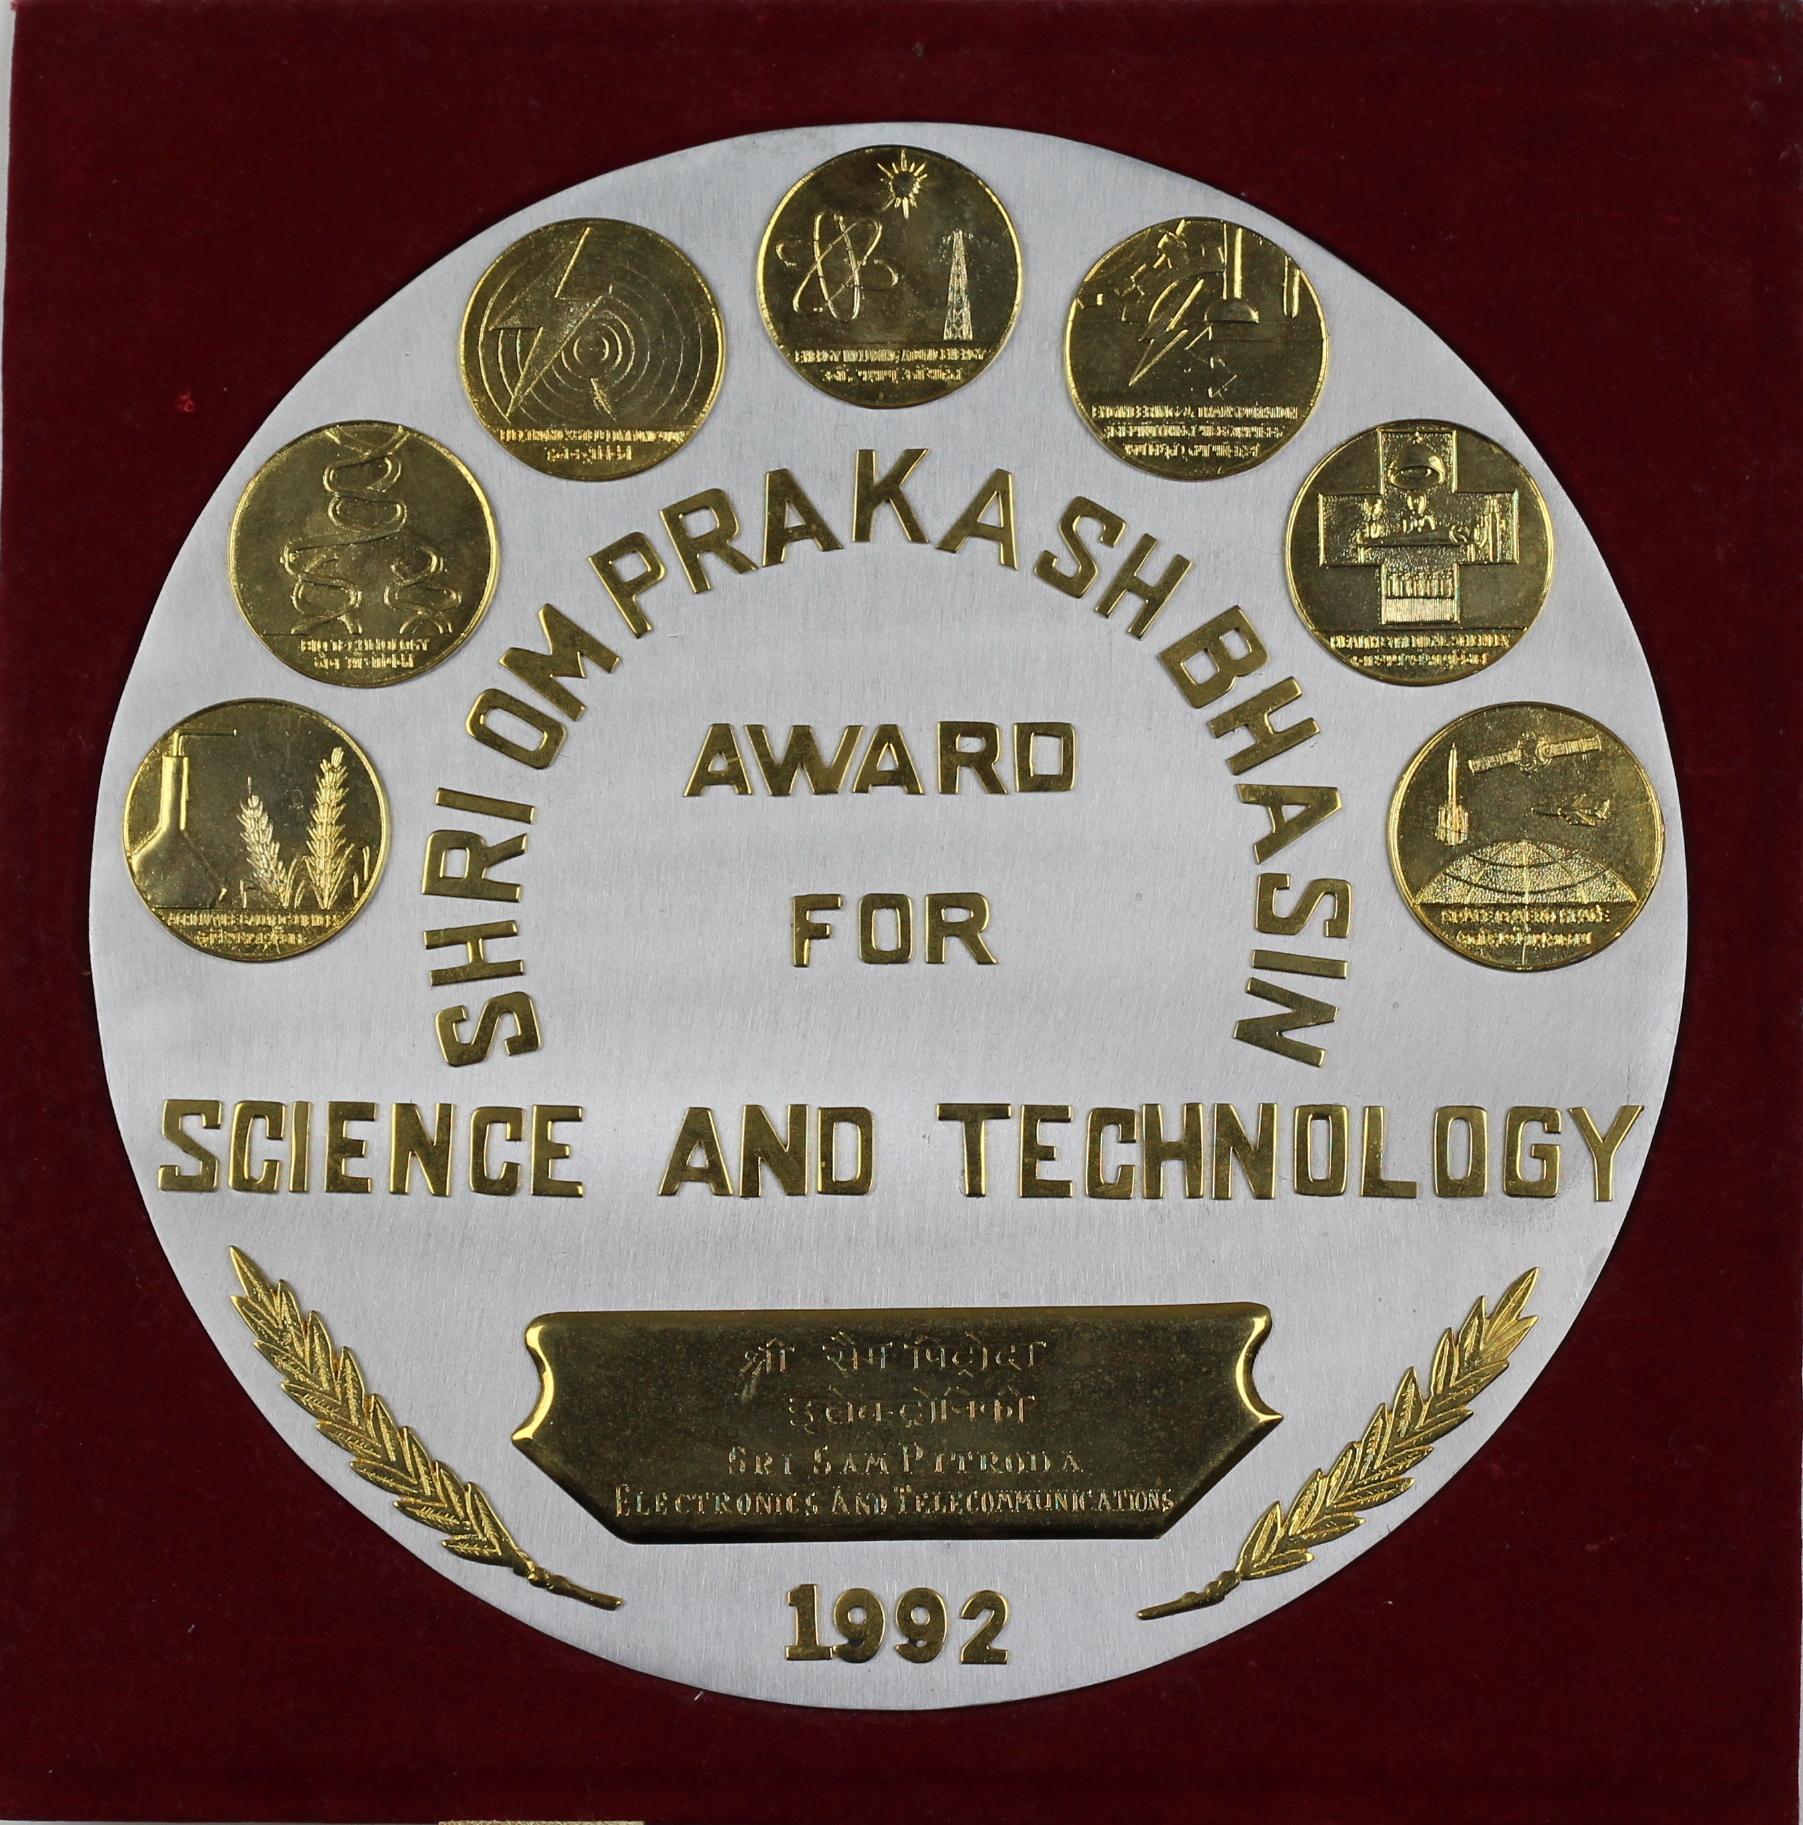 Shri Om Prakash Bhasin Award for Science and Technology, 1992